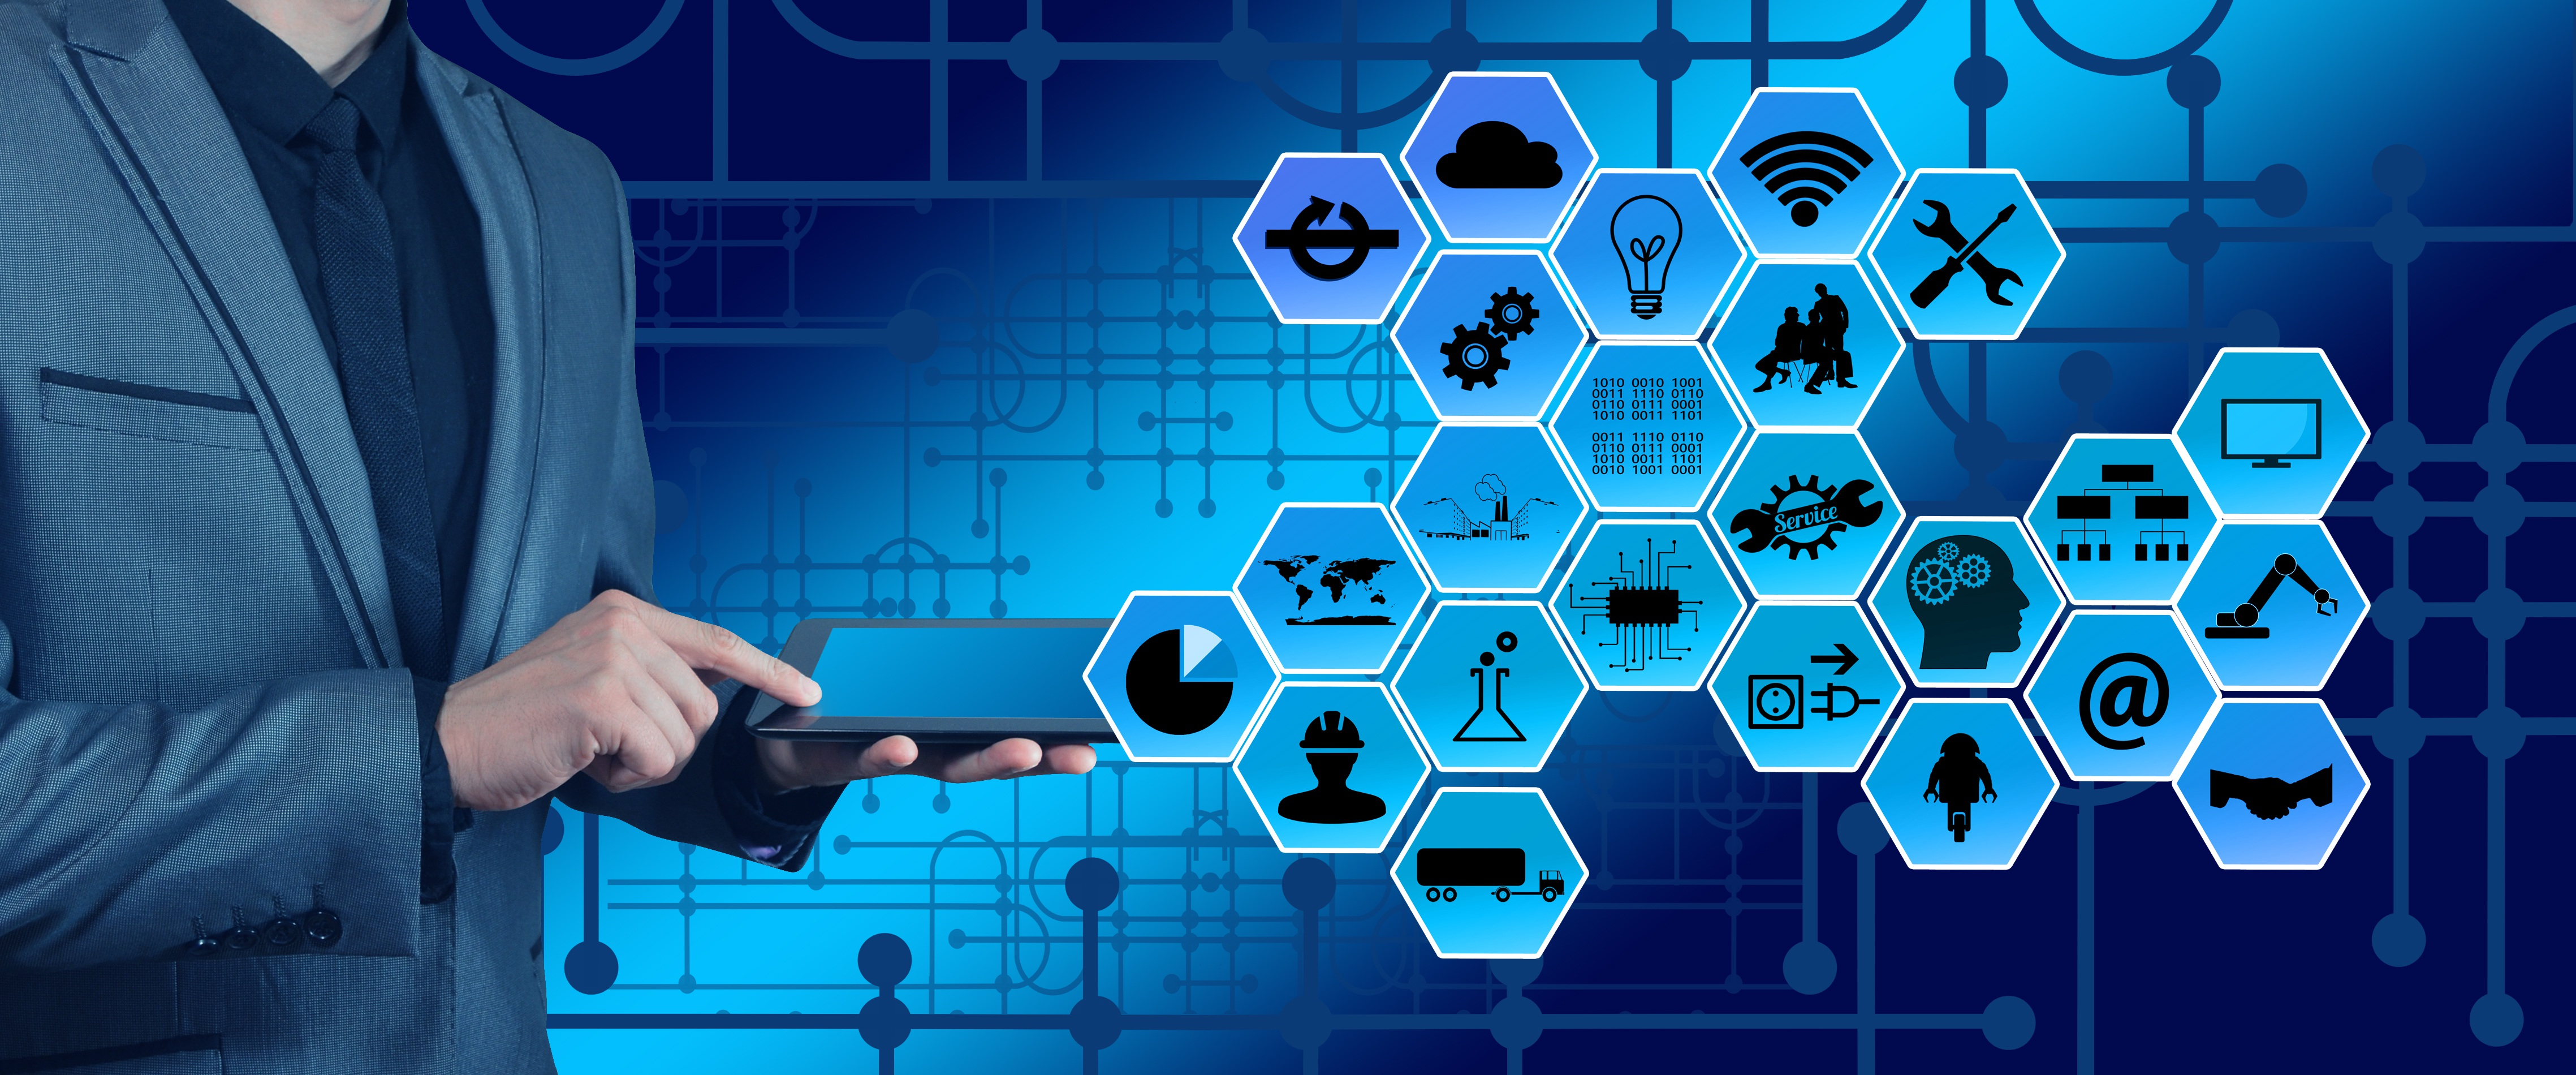 ICP经营许可证对互联网行业很重要吗?